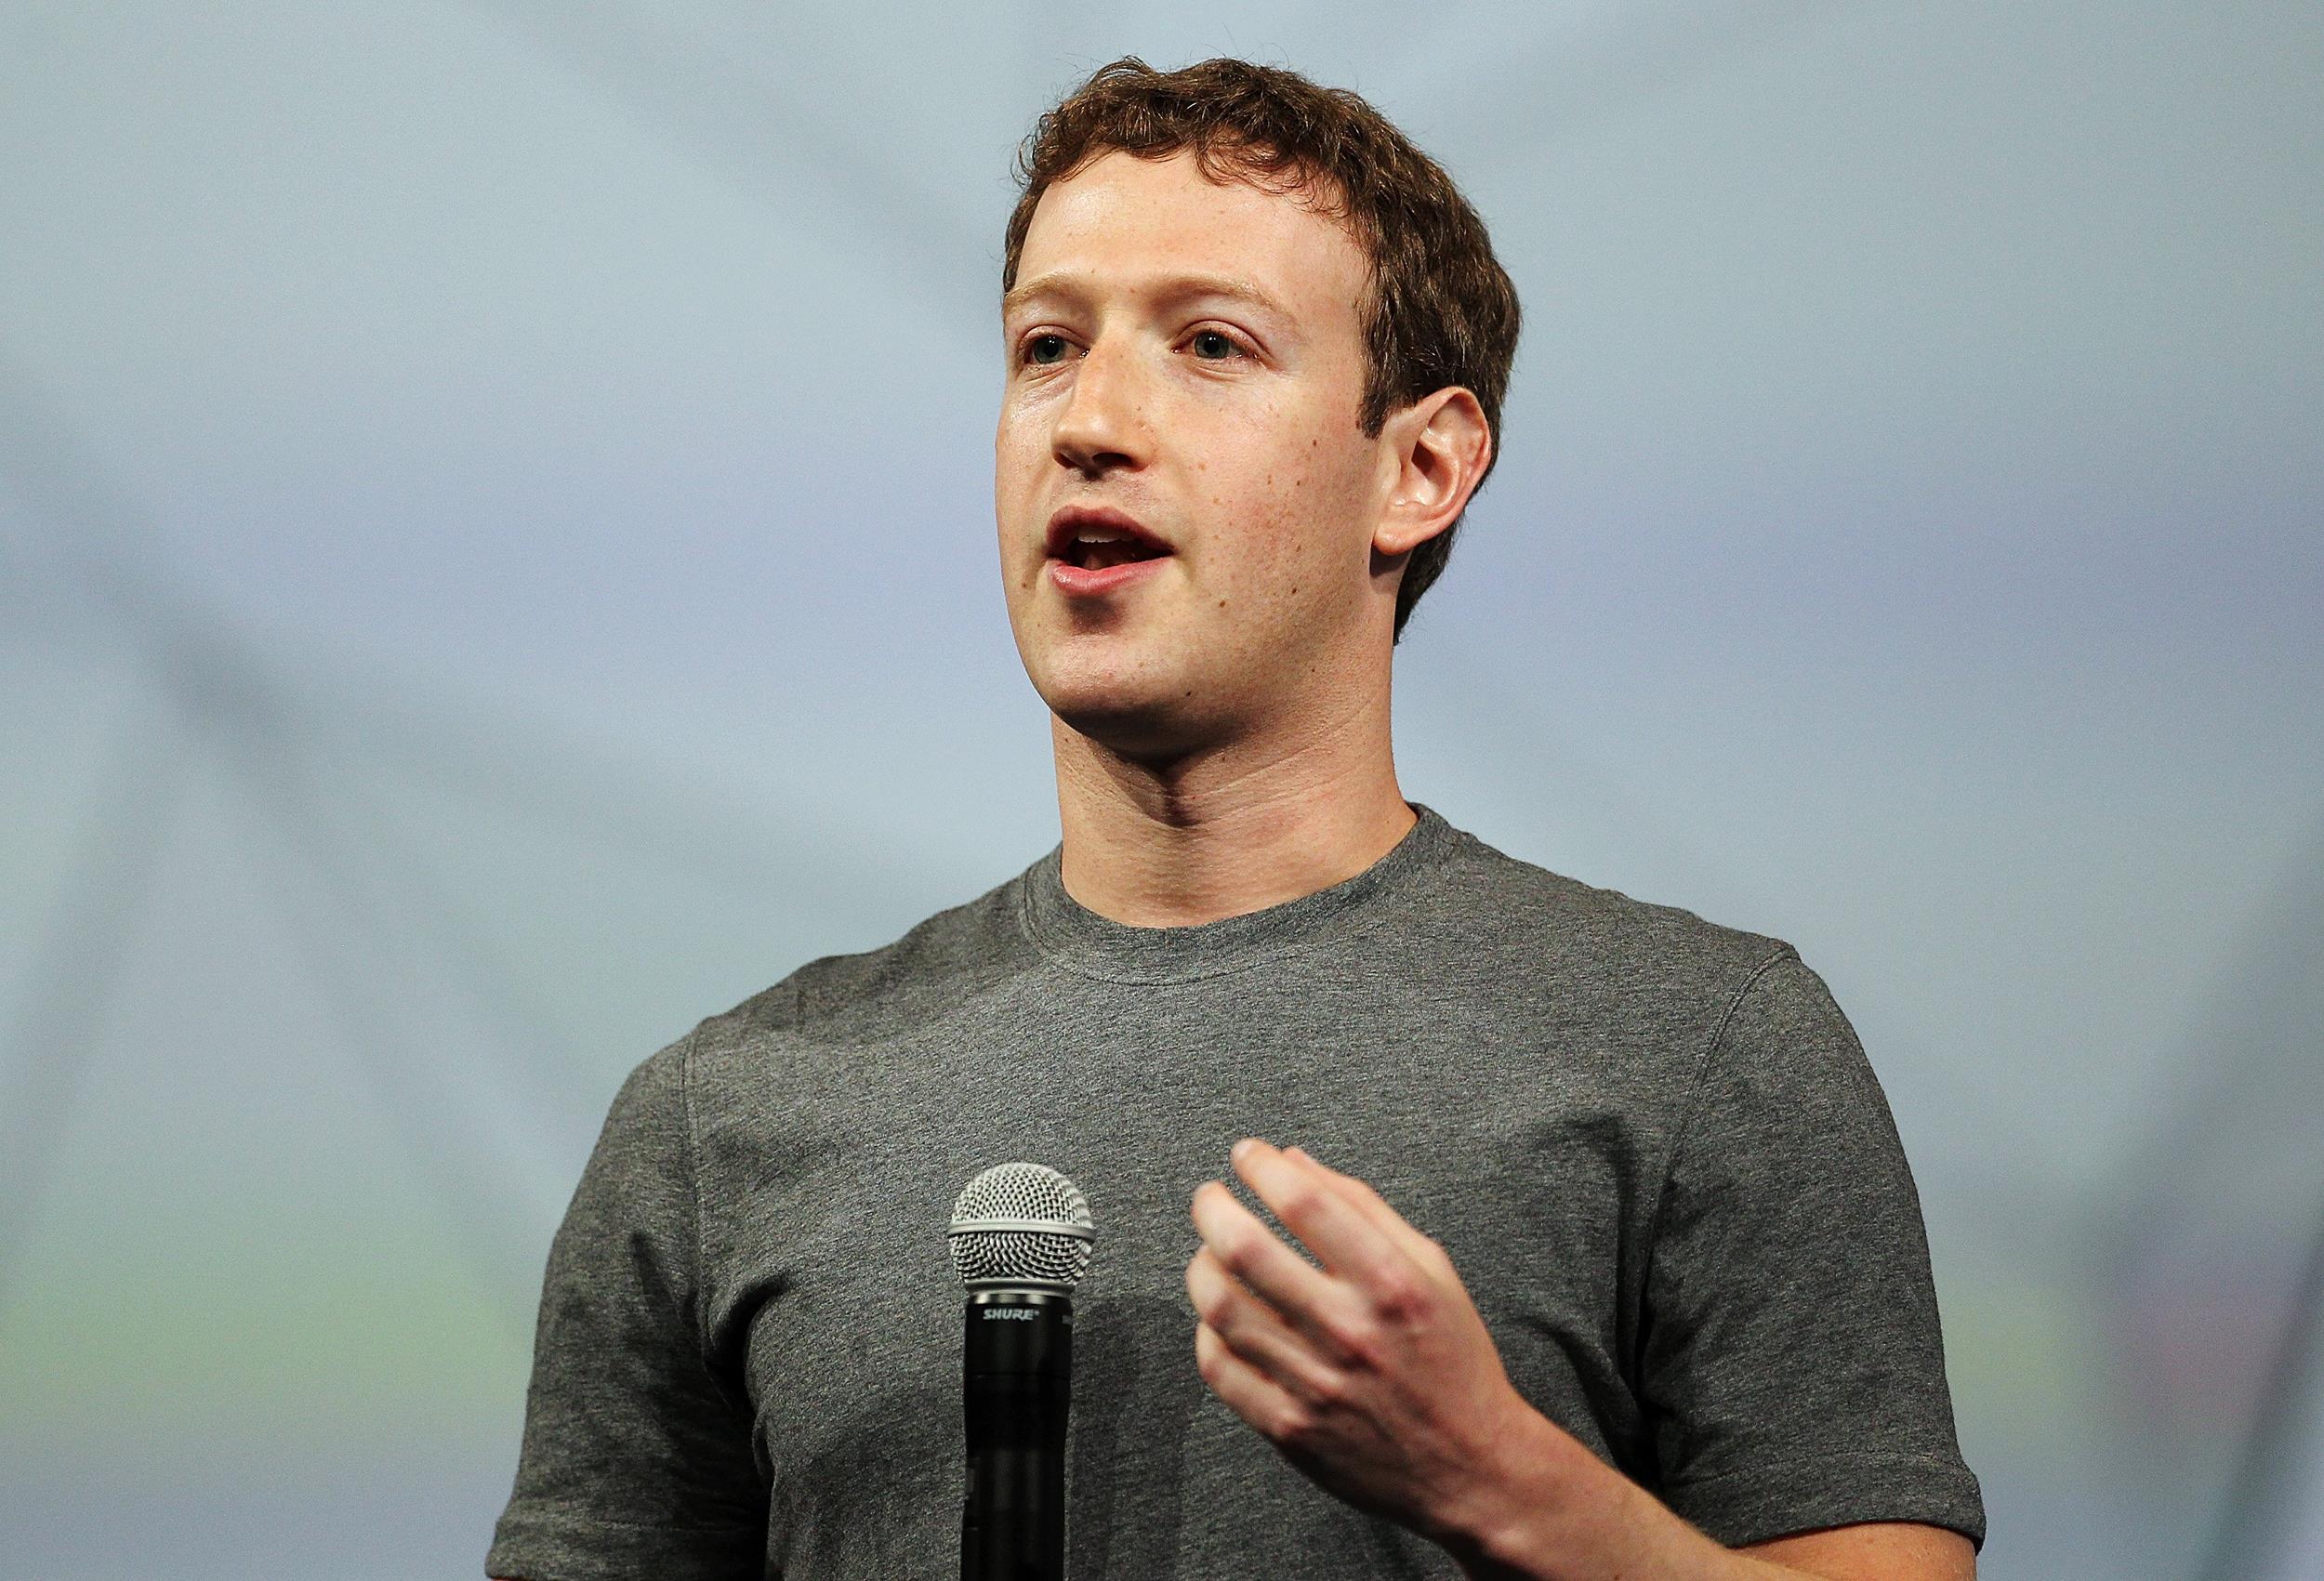 Why Do People Believe The Mark Zuckerberg Money Giveaway Hoax